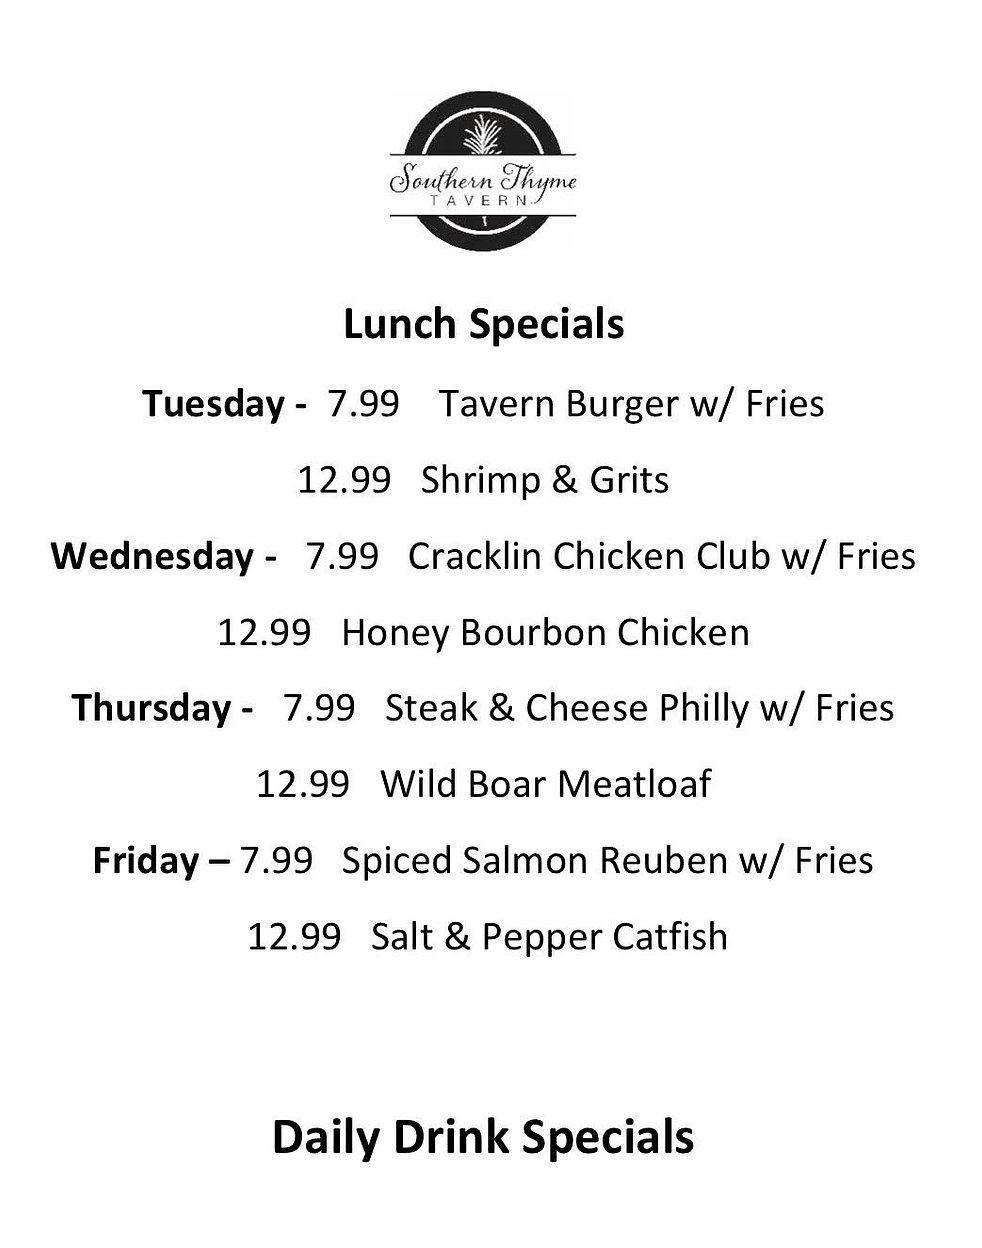 Lunch Specials for Matt Green.jpg